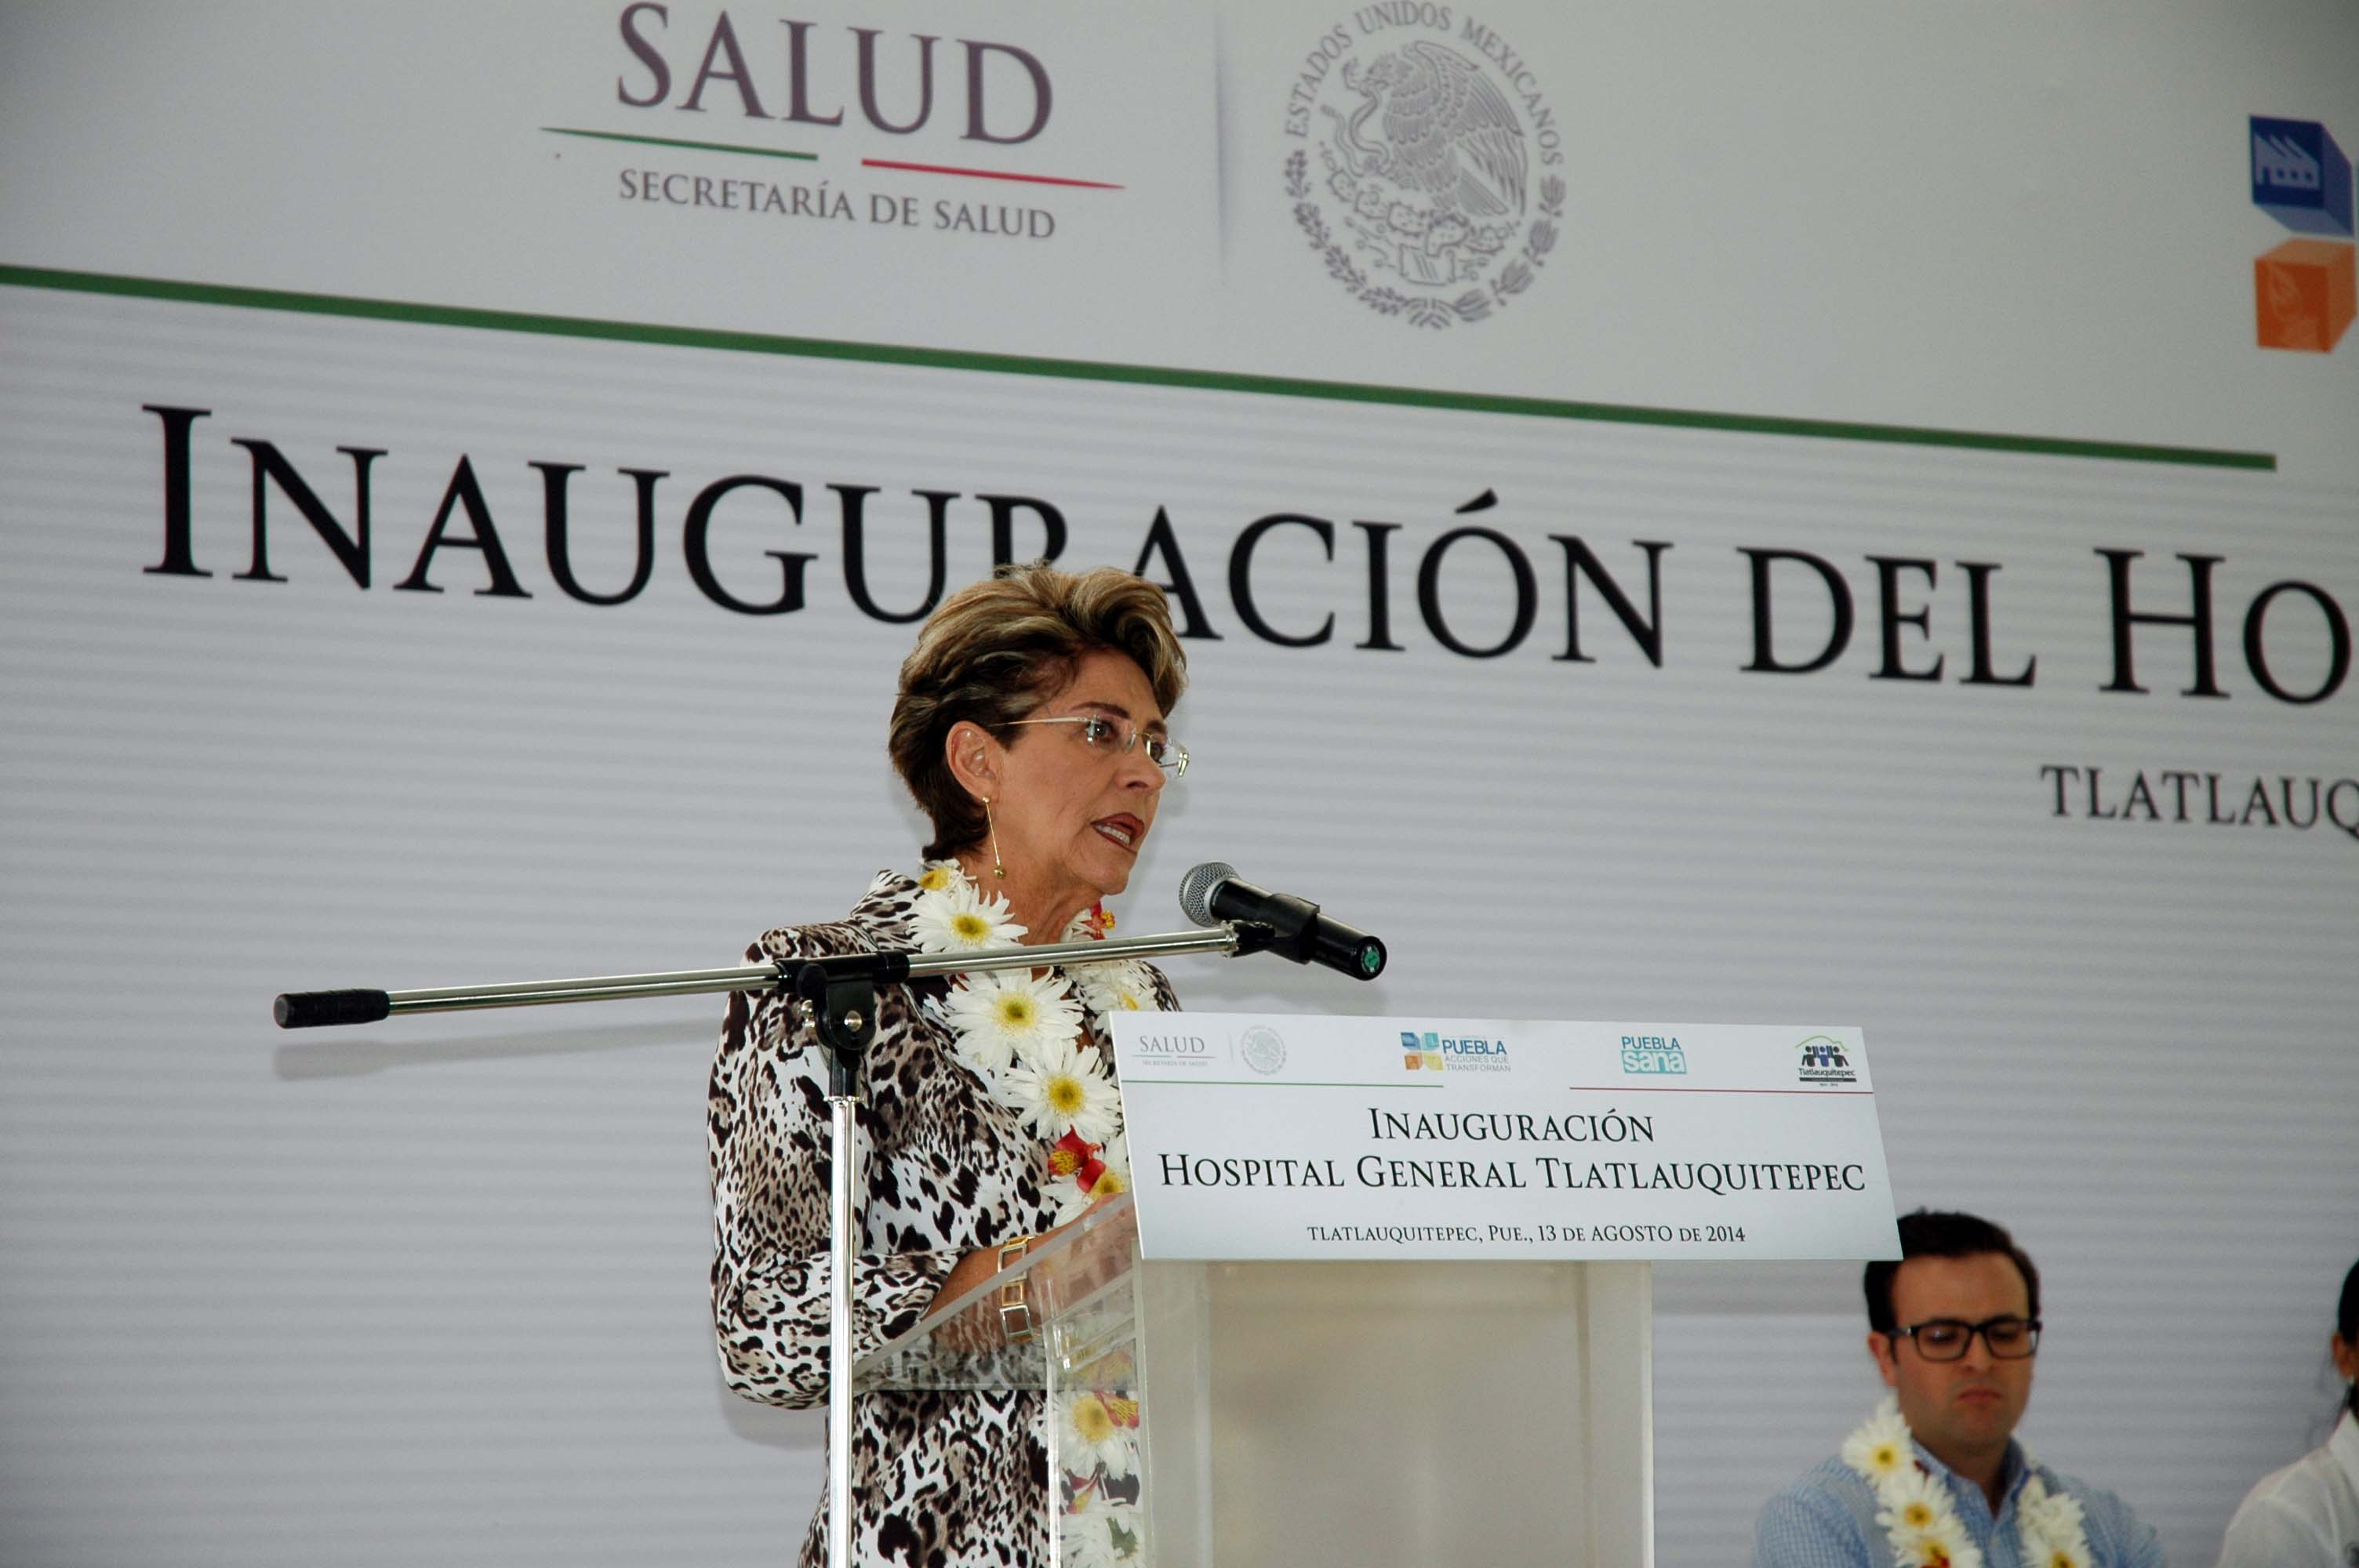 Inauguración del Hospital General de Tlatlauquitepec